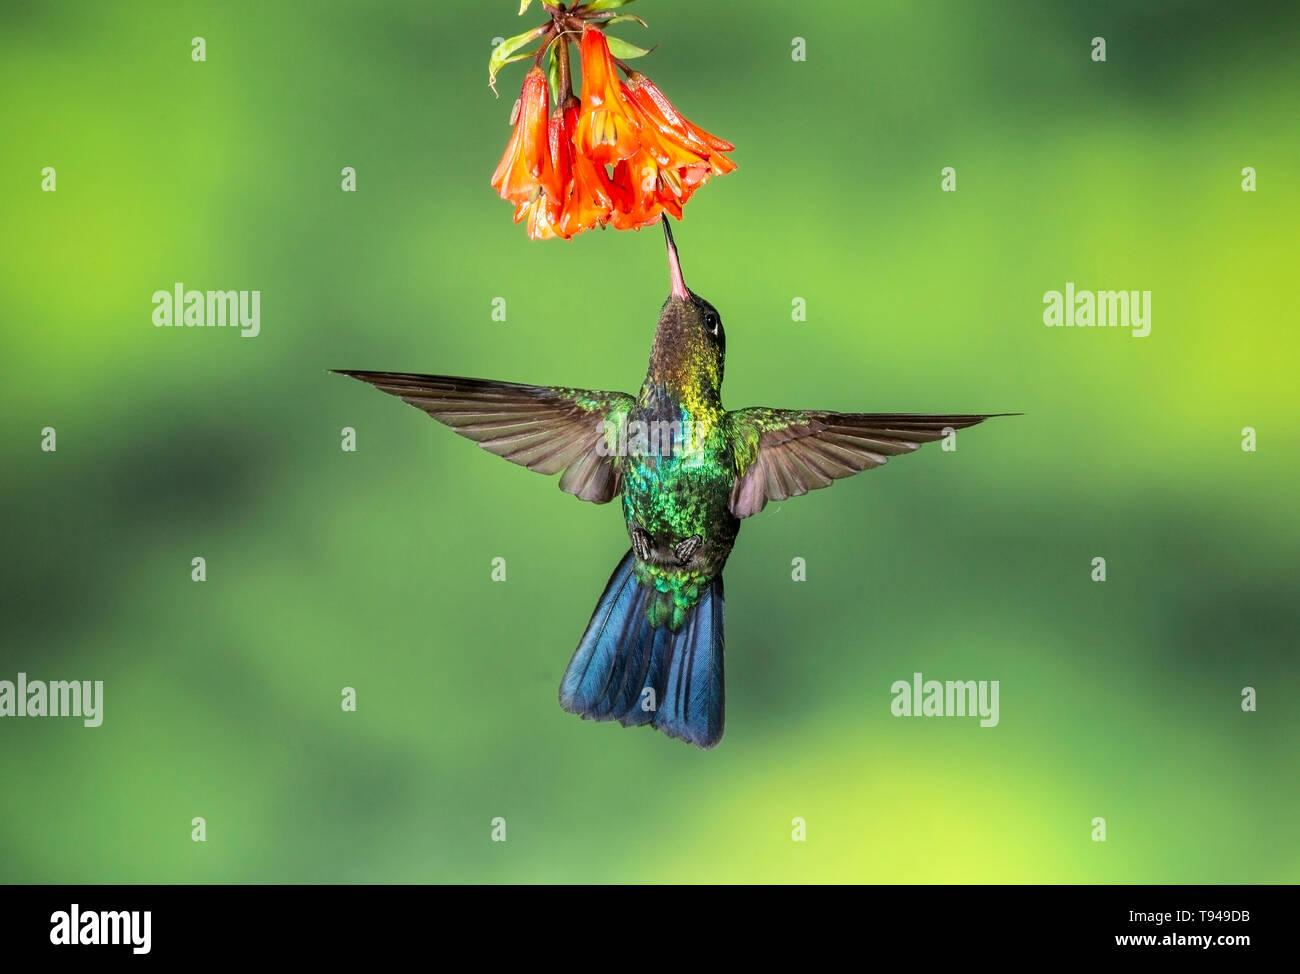 fiery-throated hummingbird in flight, feeding on nectar of flower, Costa Rica - Stock Image